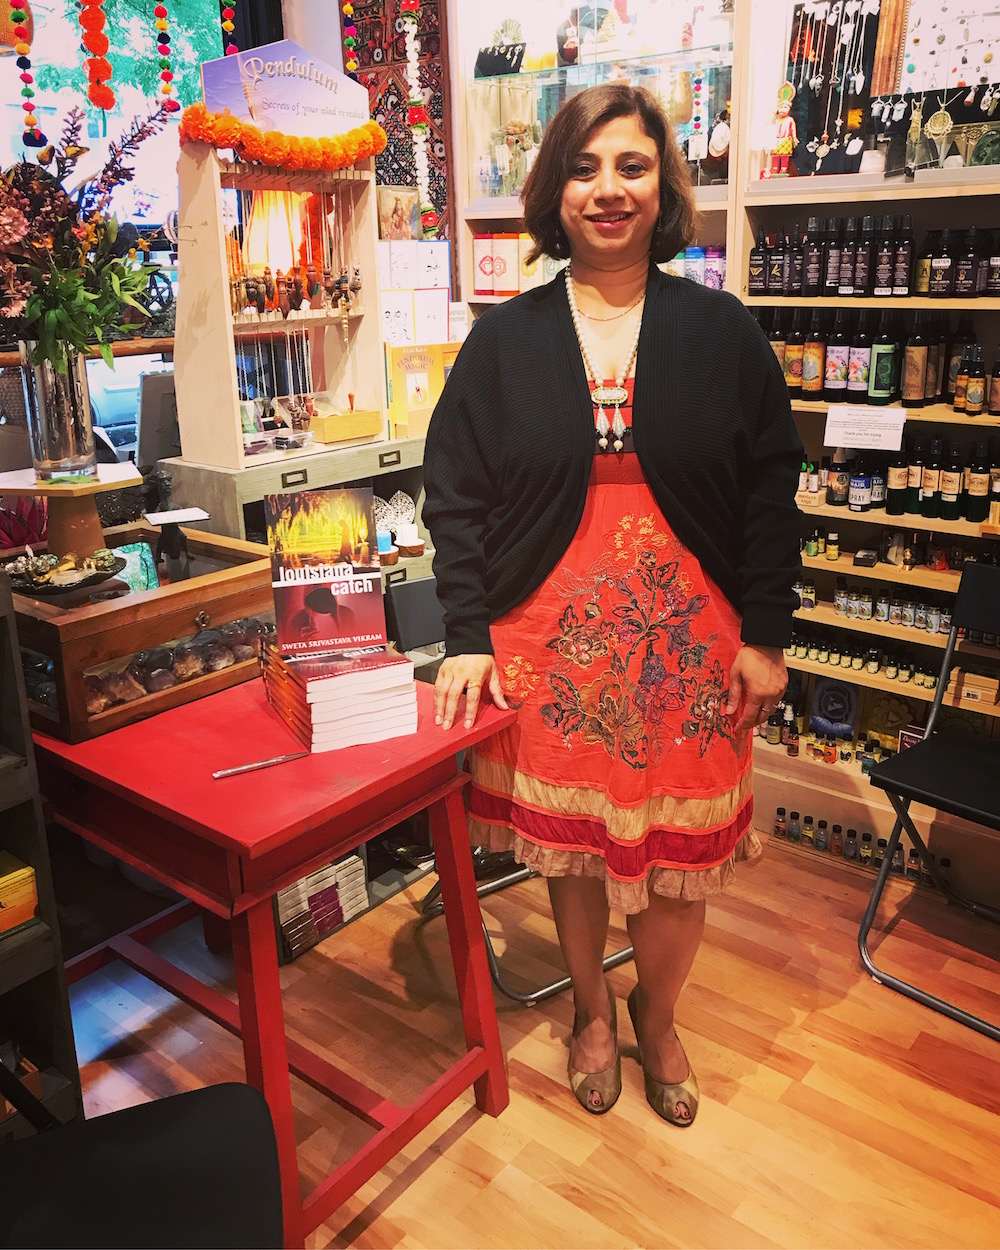 Sweta does an author meet and greet at Aum Shanti Bookshop.